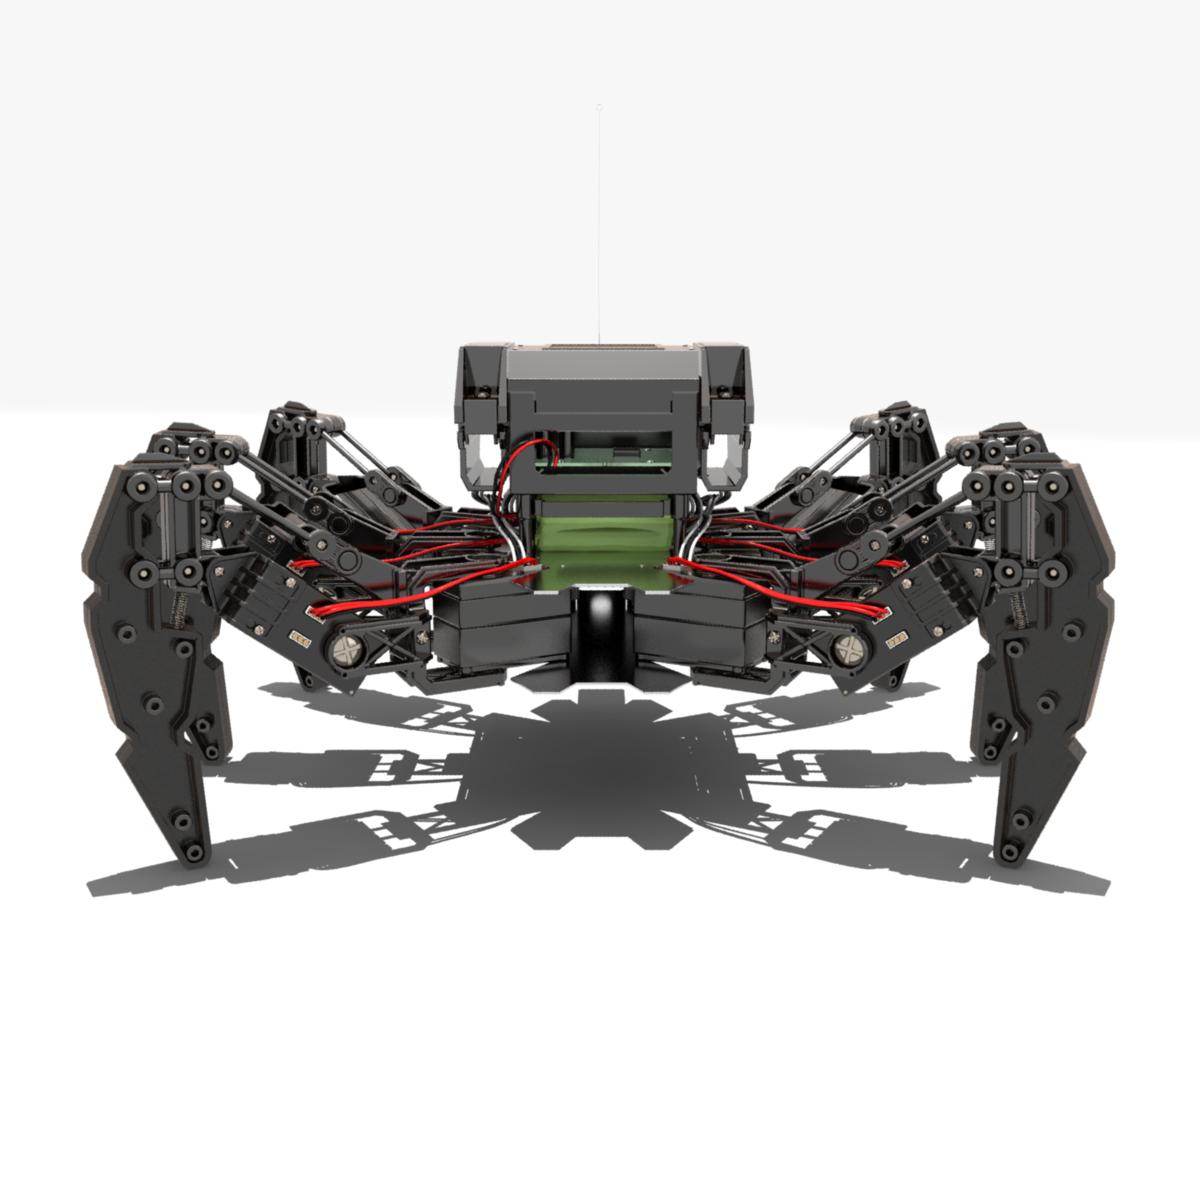 Japanese Hexapod Robot Kondo KMR-M6 3D Model in Toys 3DExport